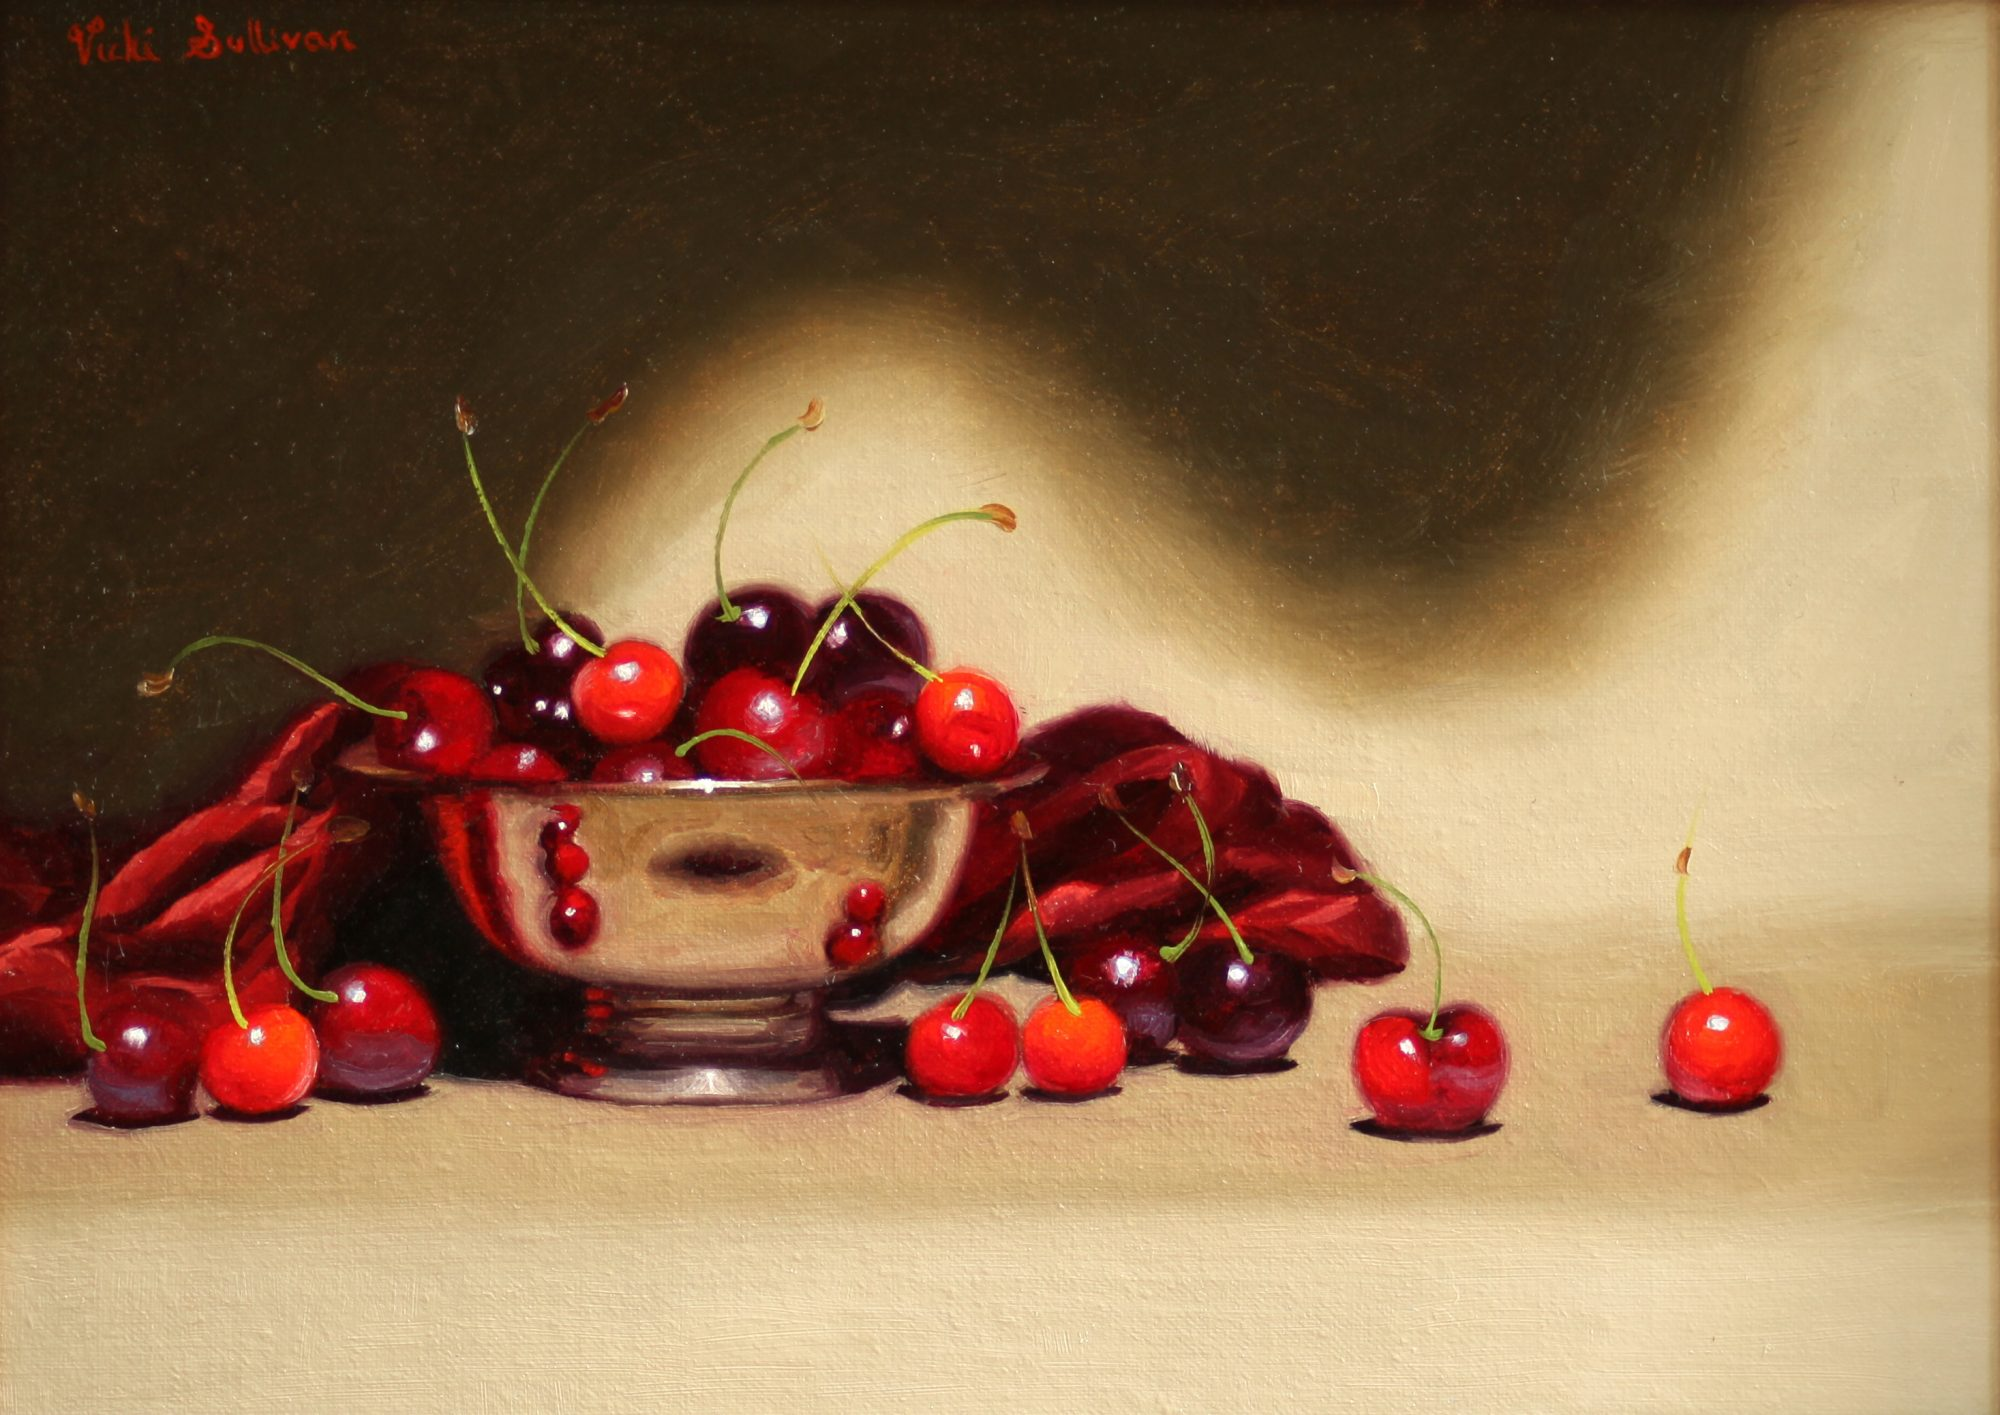 Cherries With Silver Bowl Vicki Sullivan Art Lovers Australia Still Life Oil On Linen H 25cm X W 34cm